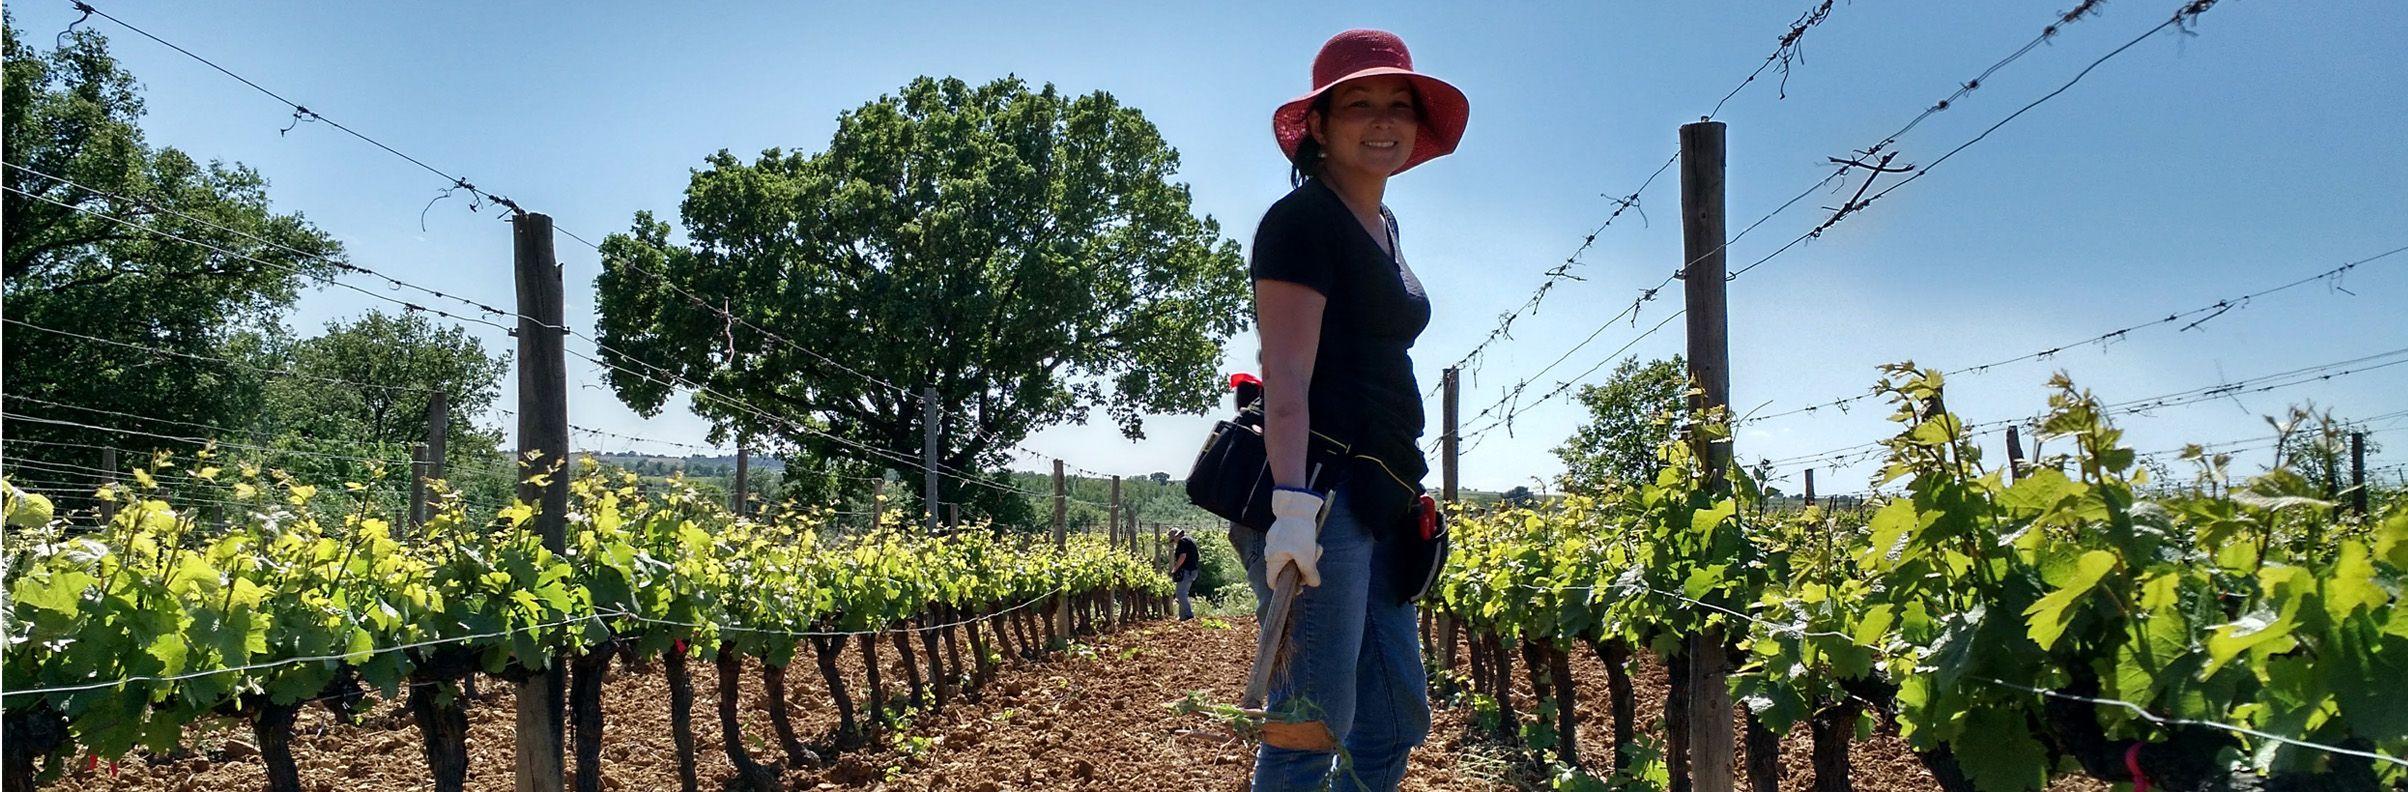 Bassac vineyard worker